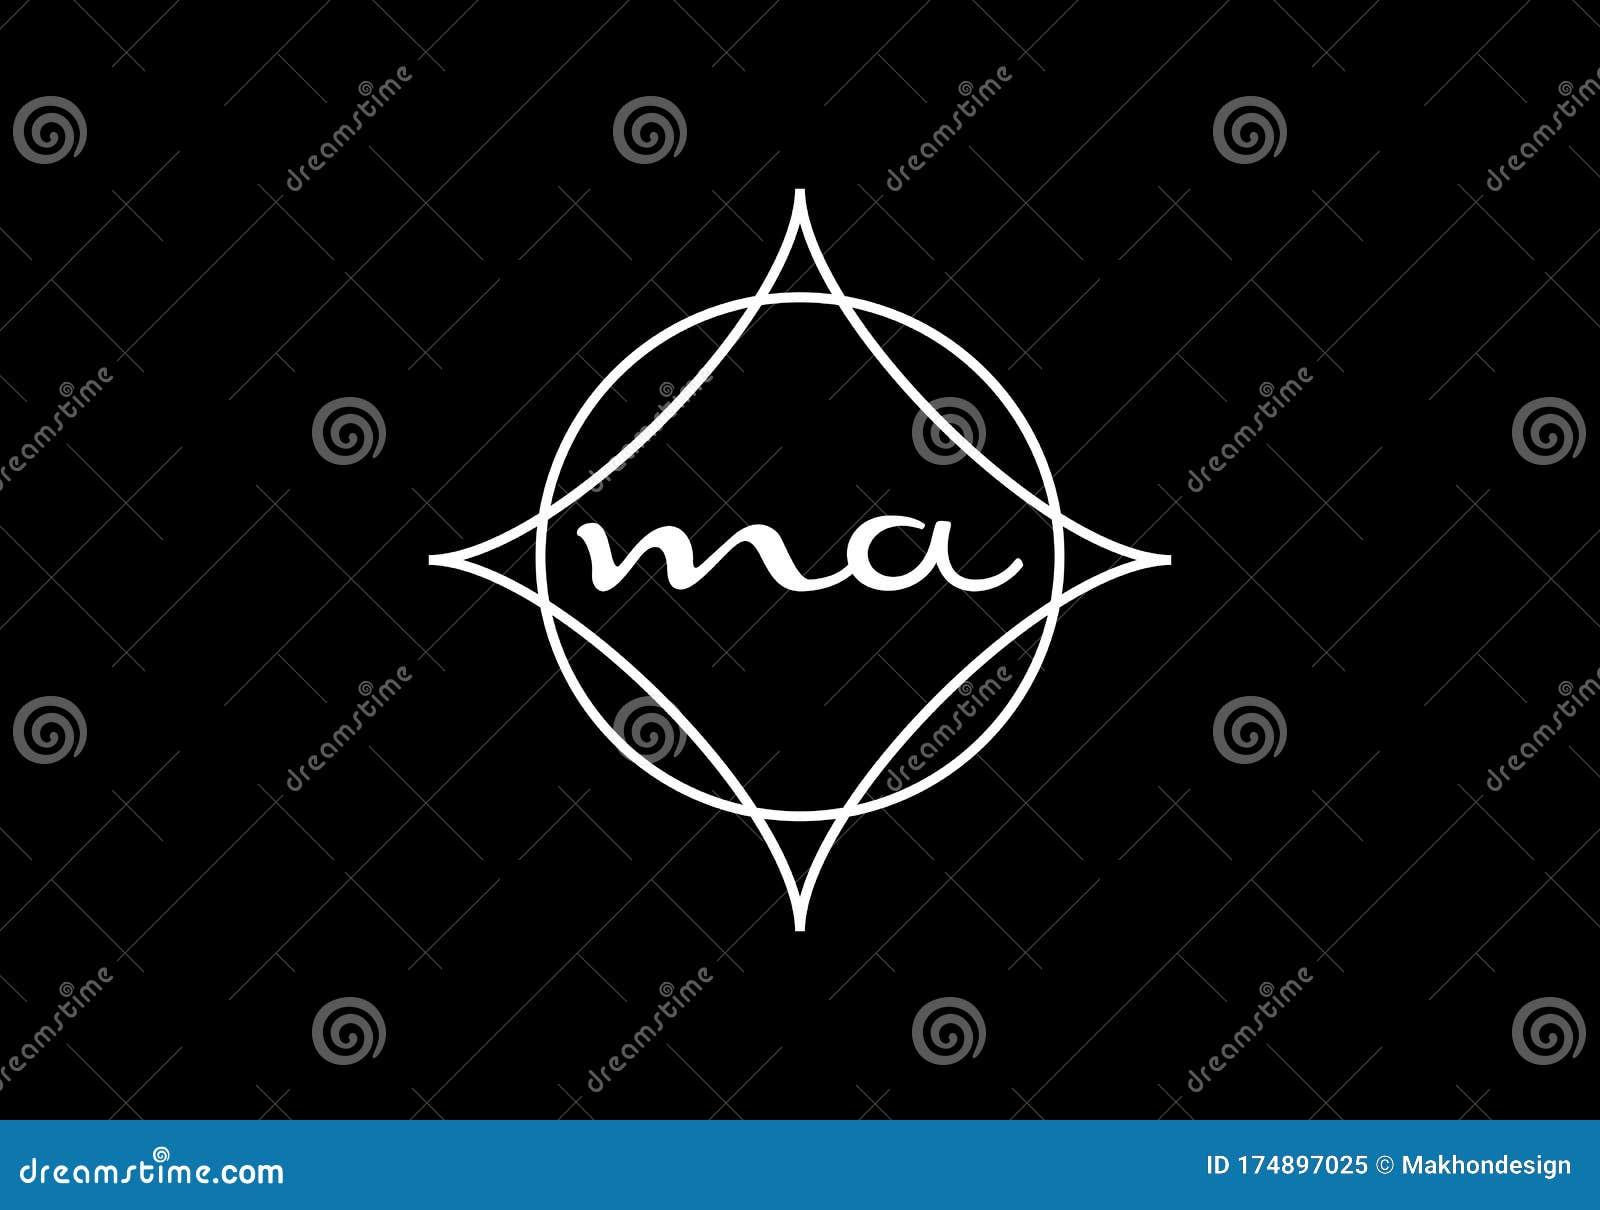 Initial Letter M A Logo Design Vector Template Monogram Logo Sign Stock Vector Illustration Of Business Branding 174897025